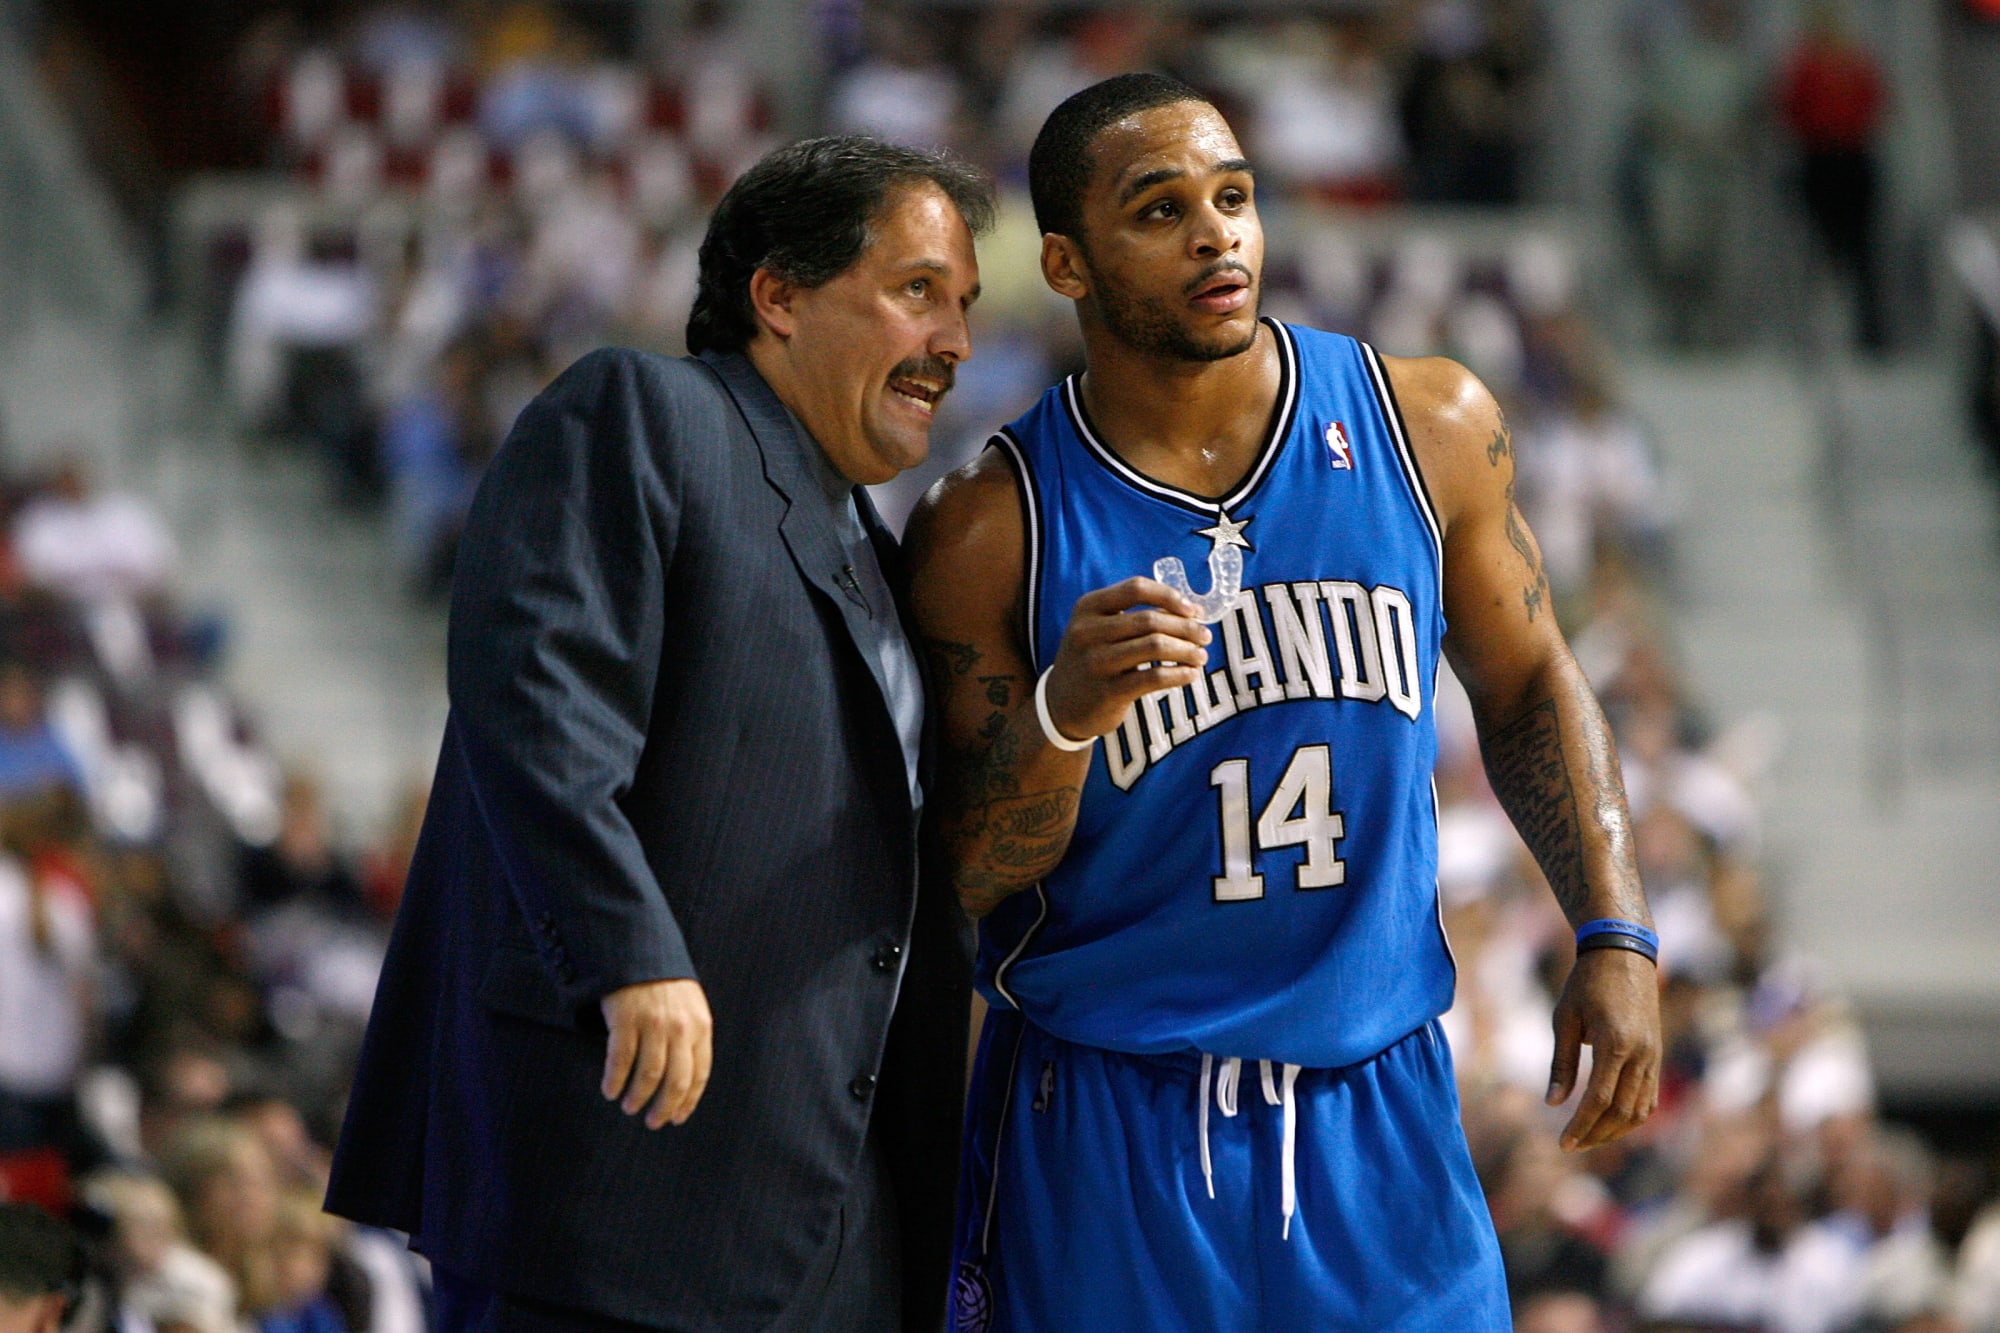 Pelicans: Stan Van Gundy's work with Jameer Nelson will help Lonzo Ball